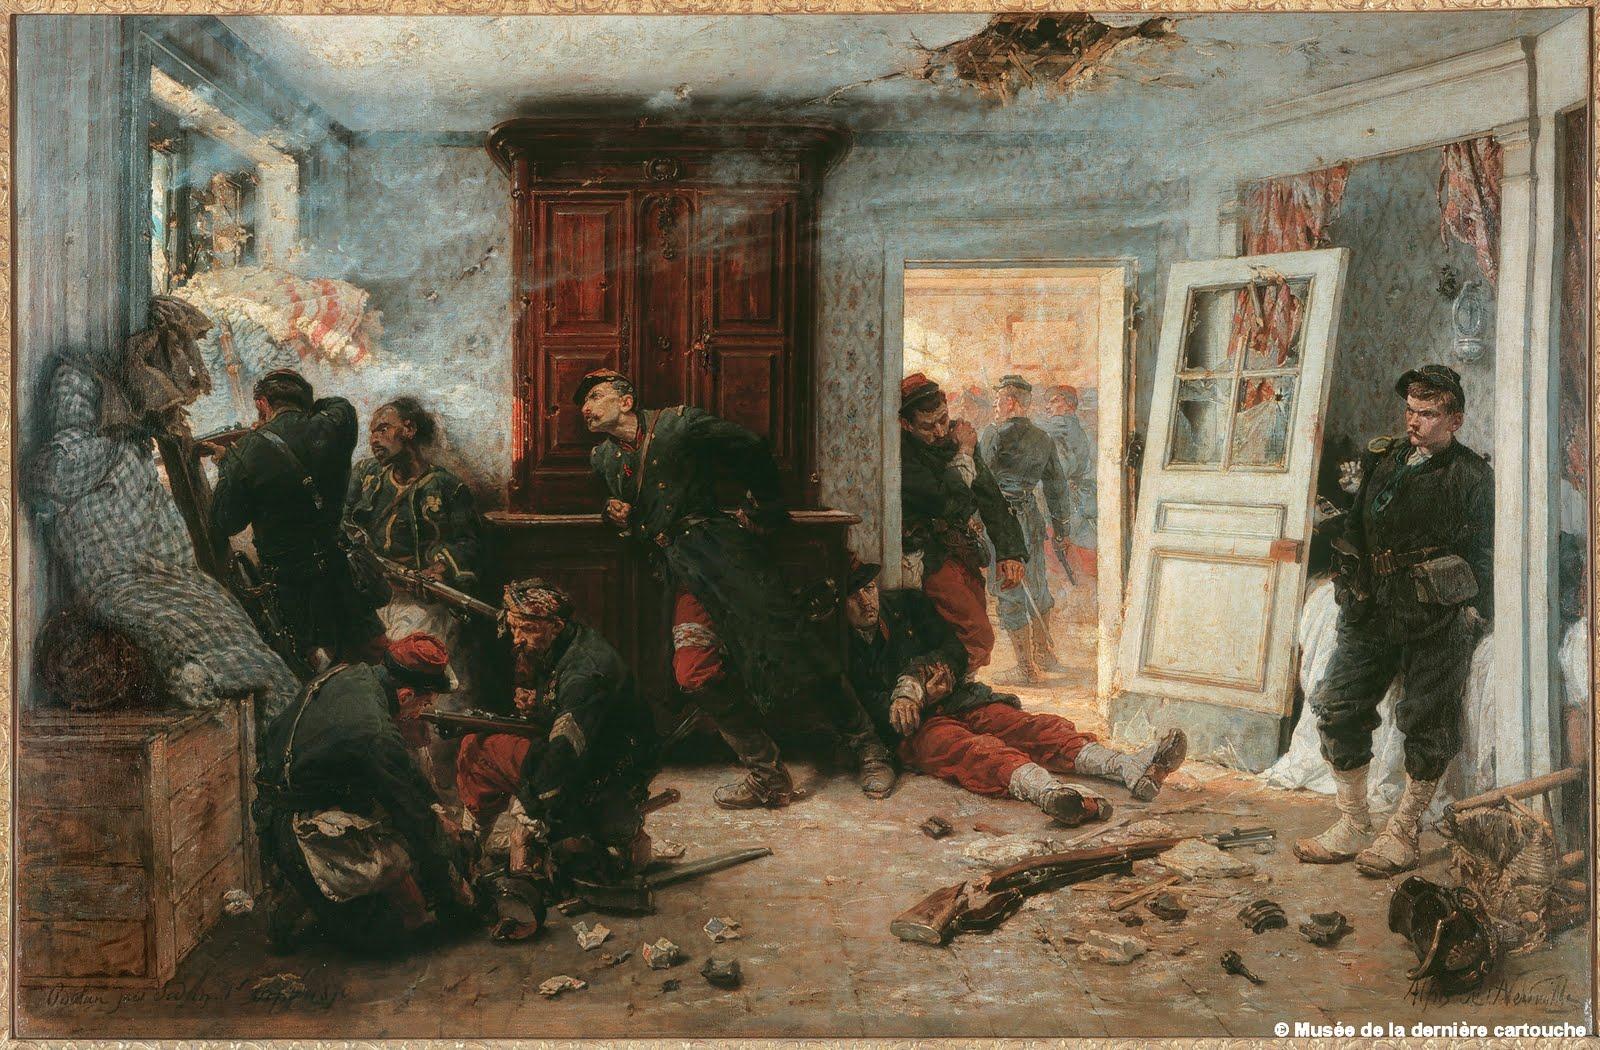 arqueologia del punt de vista: La Casa de la Última Bala. Batallas ...